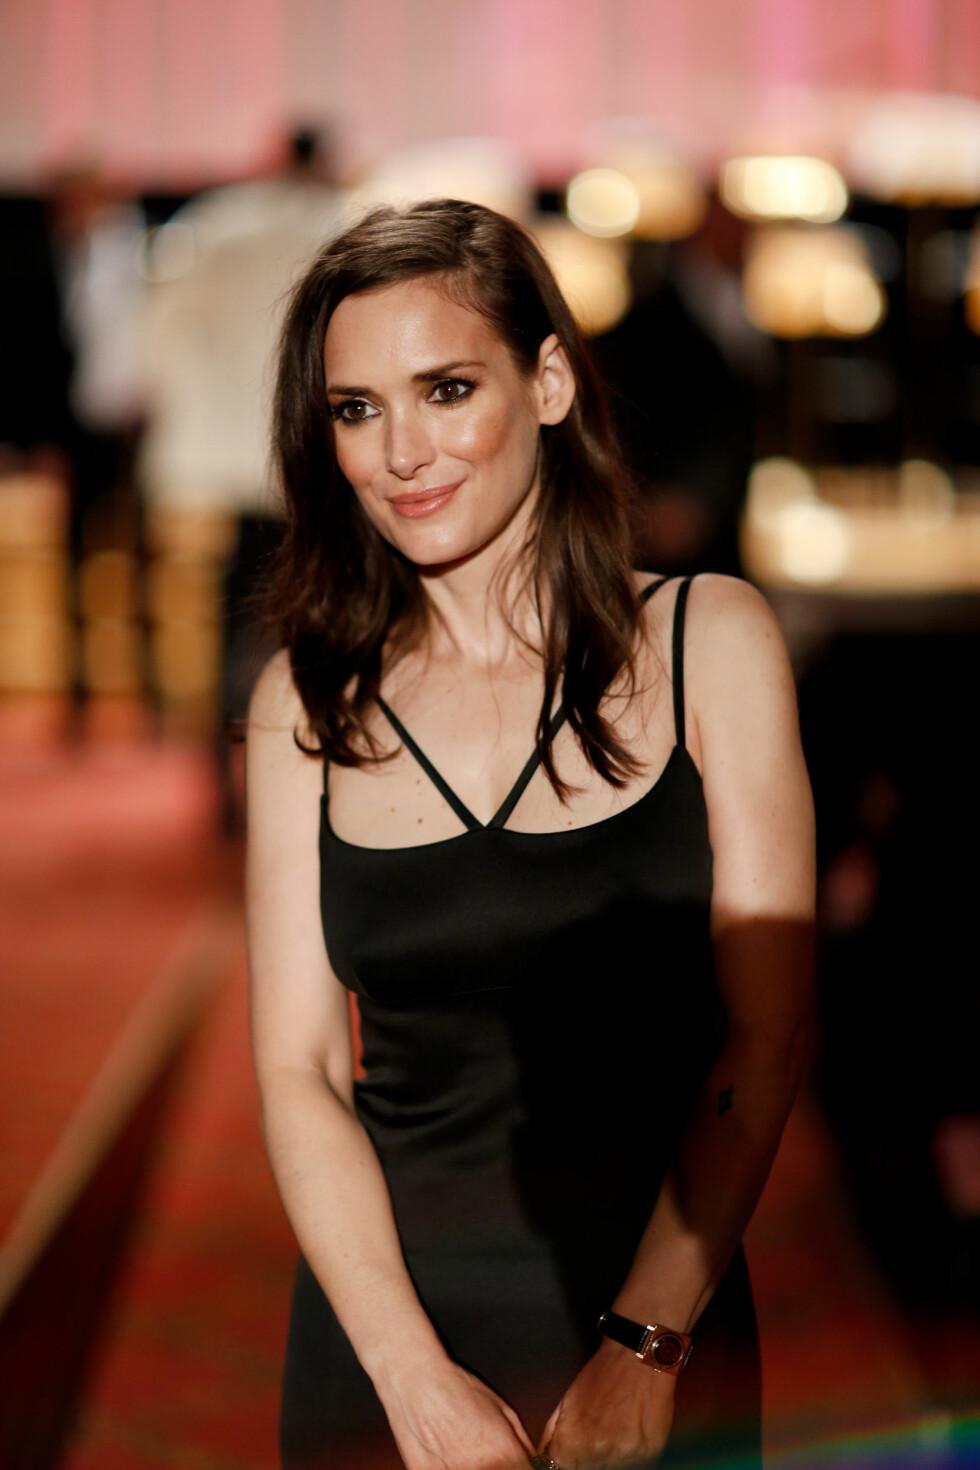 ALDRI VÆRT GIFT: Skuespiller Winona Ryder (44). Foto: NTB Scanpix